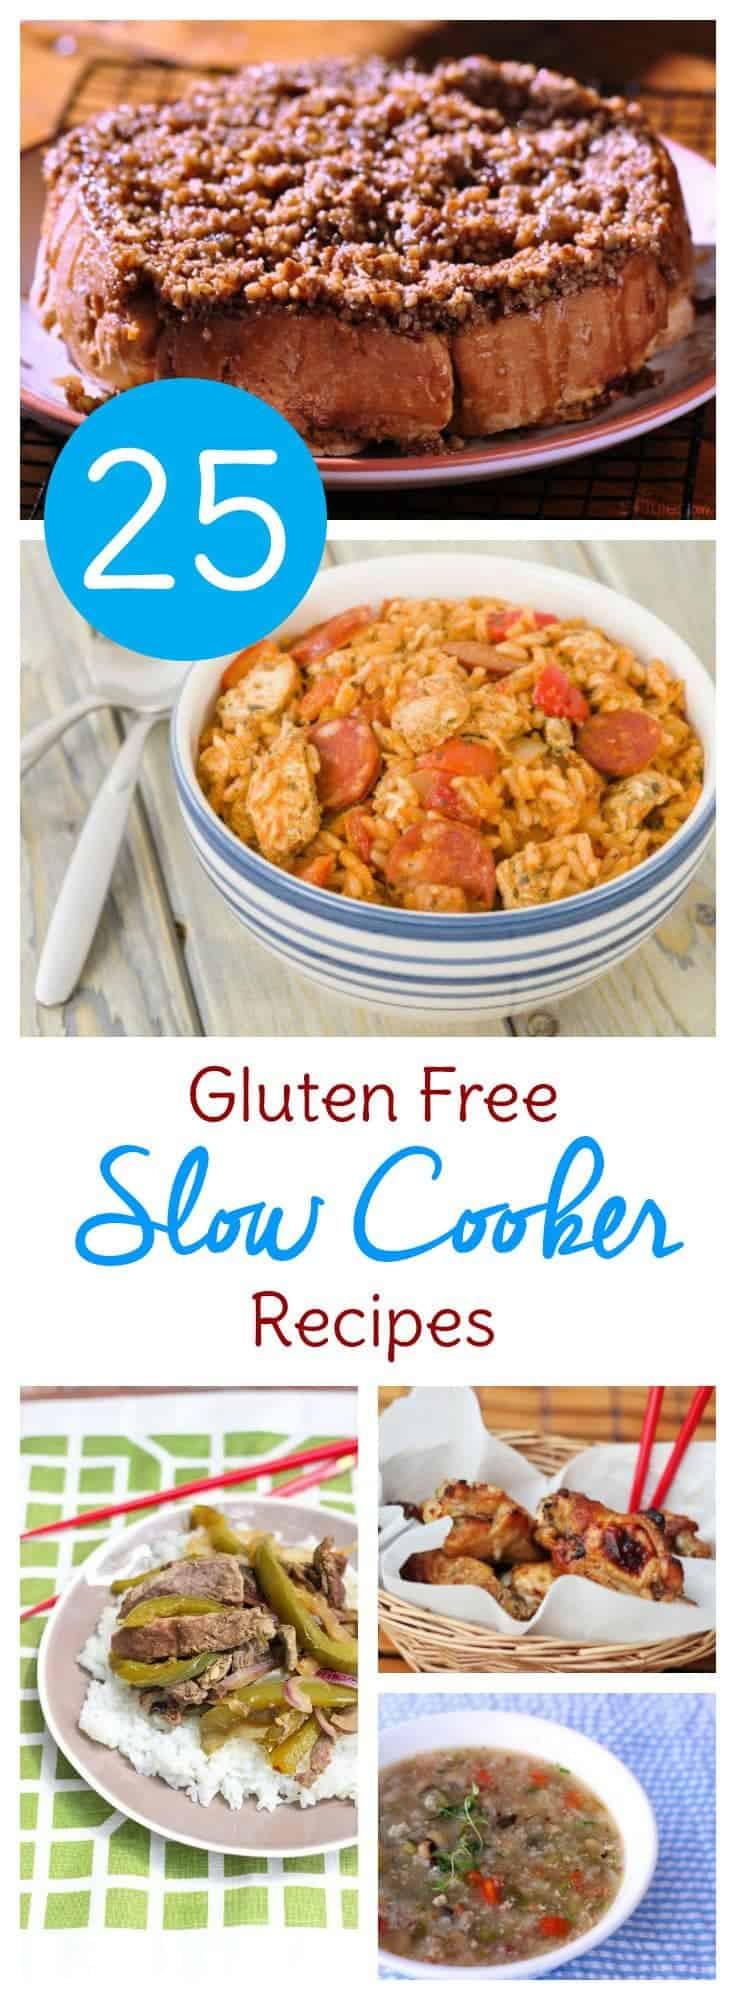 Gluten Free Dairy Free Crockpot Recipes  Gluten free crock pot recipes easy Food easy recipes